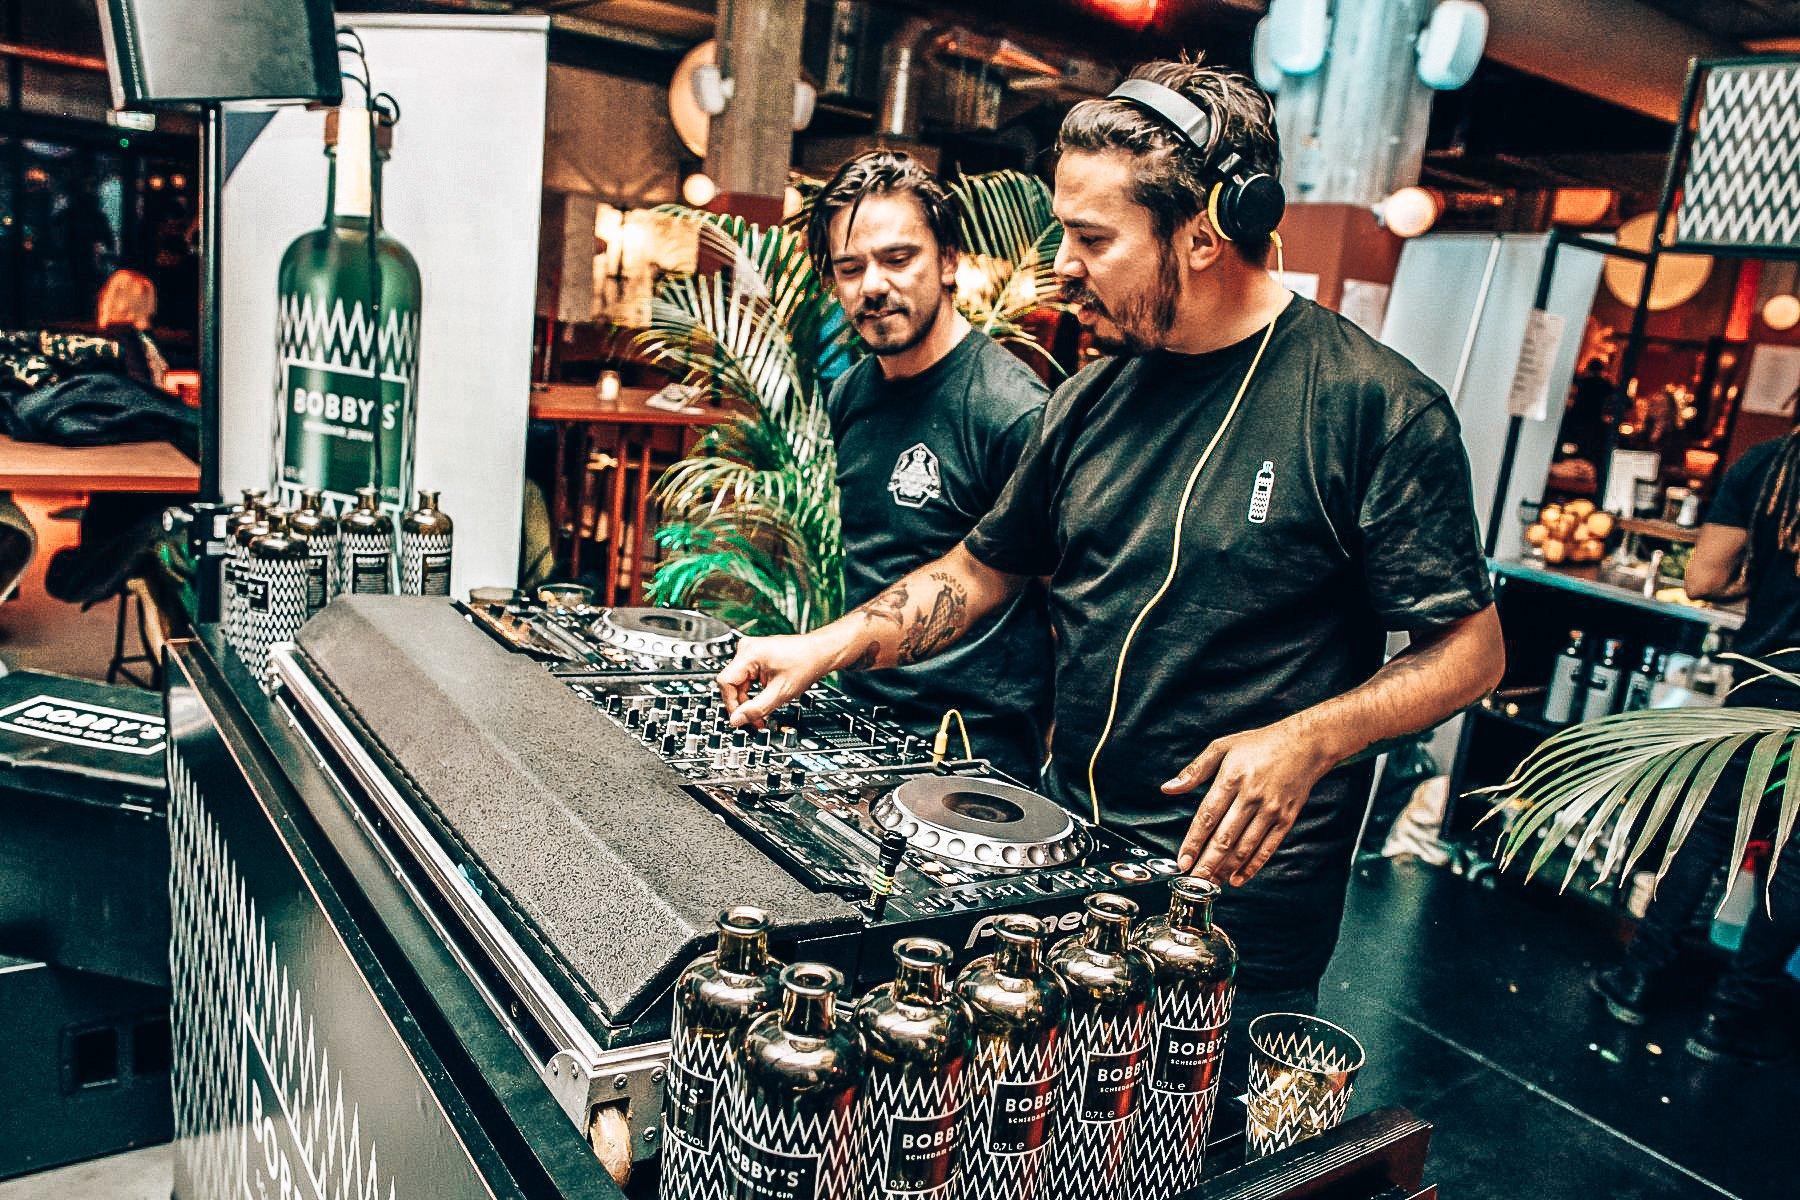 Bobby's on tour, Bobby's Schiedam Dry Gin, Alles over gin.